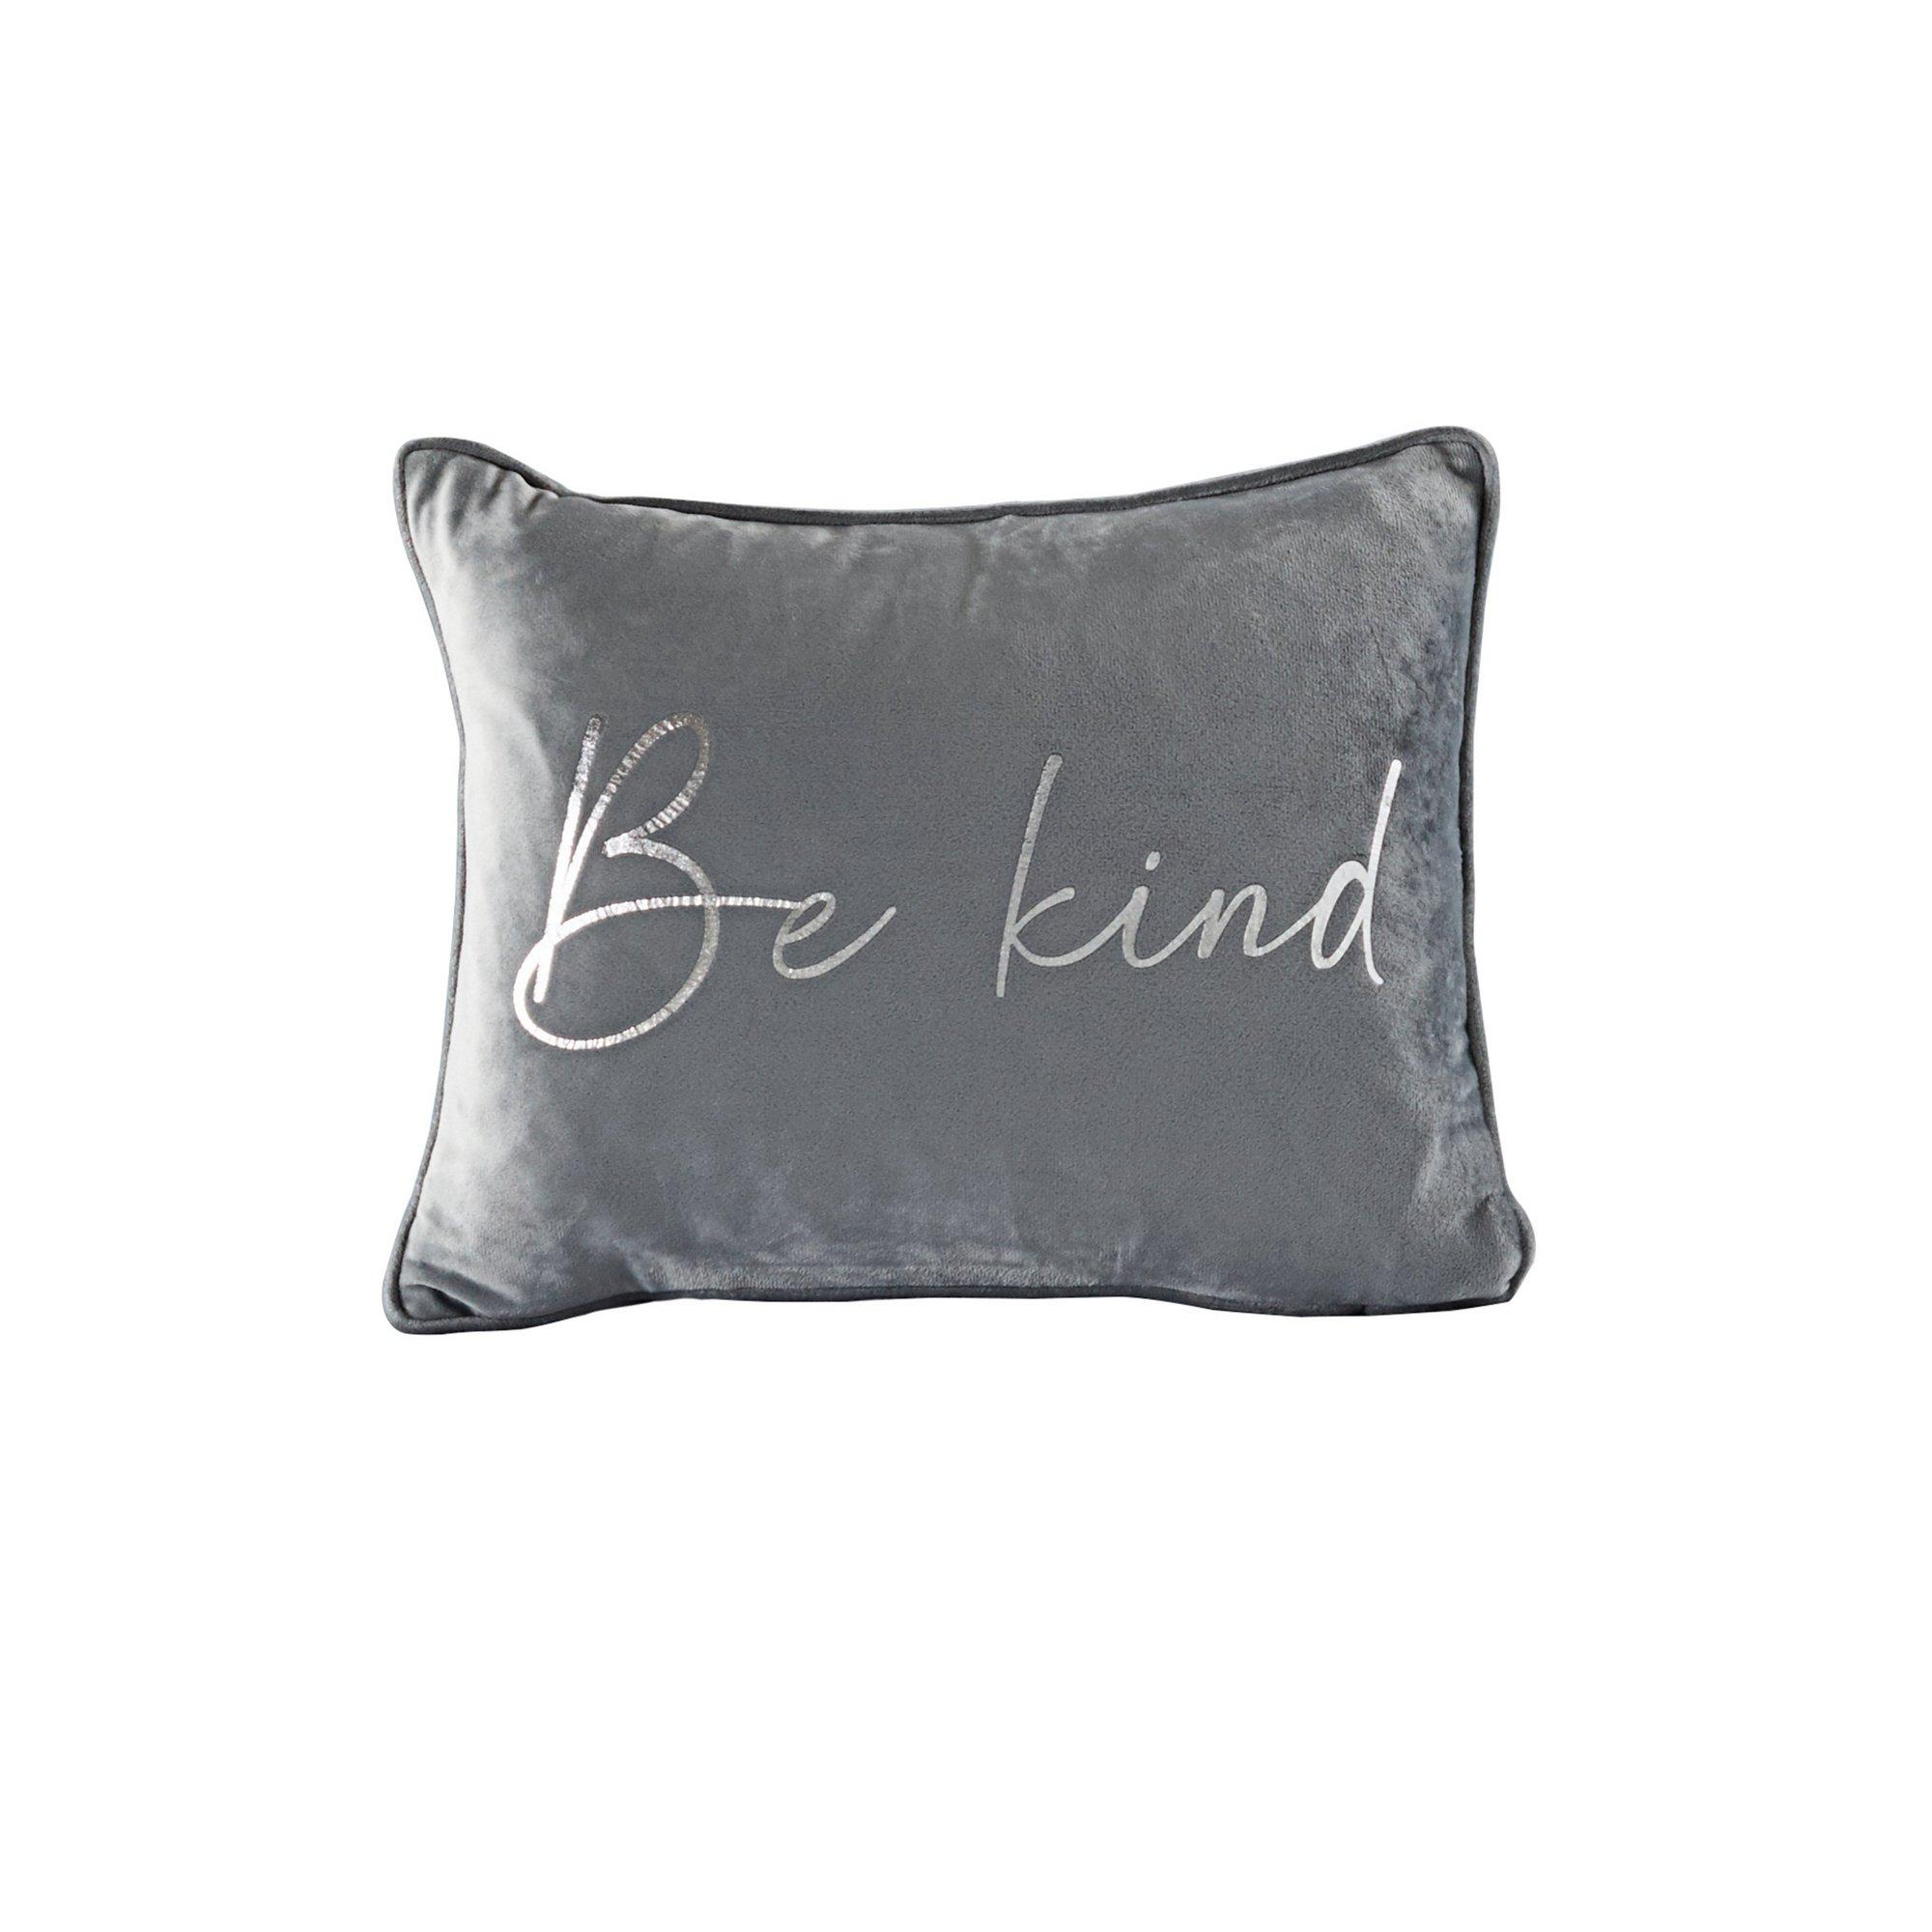 Image of Caprice Be Kind Cushion